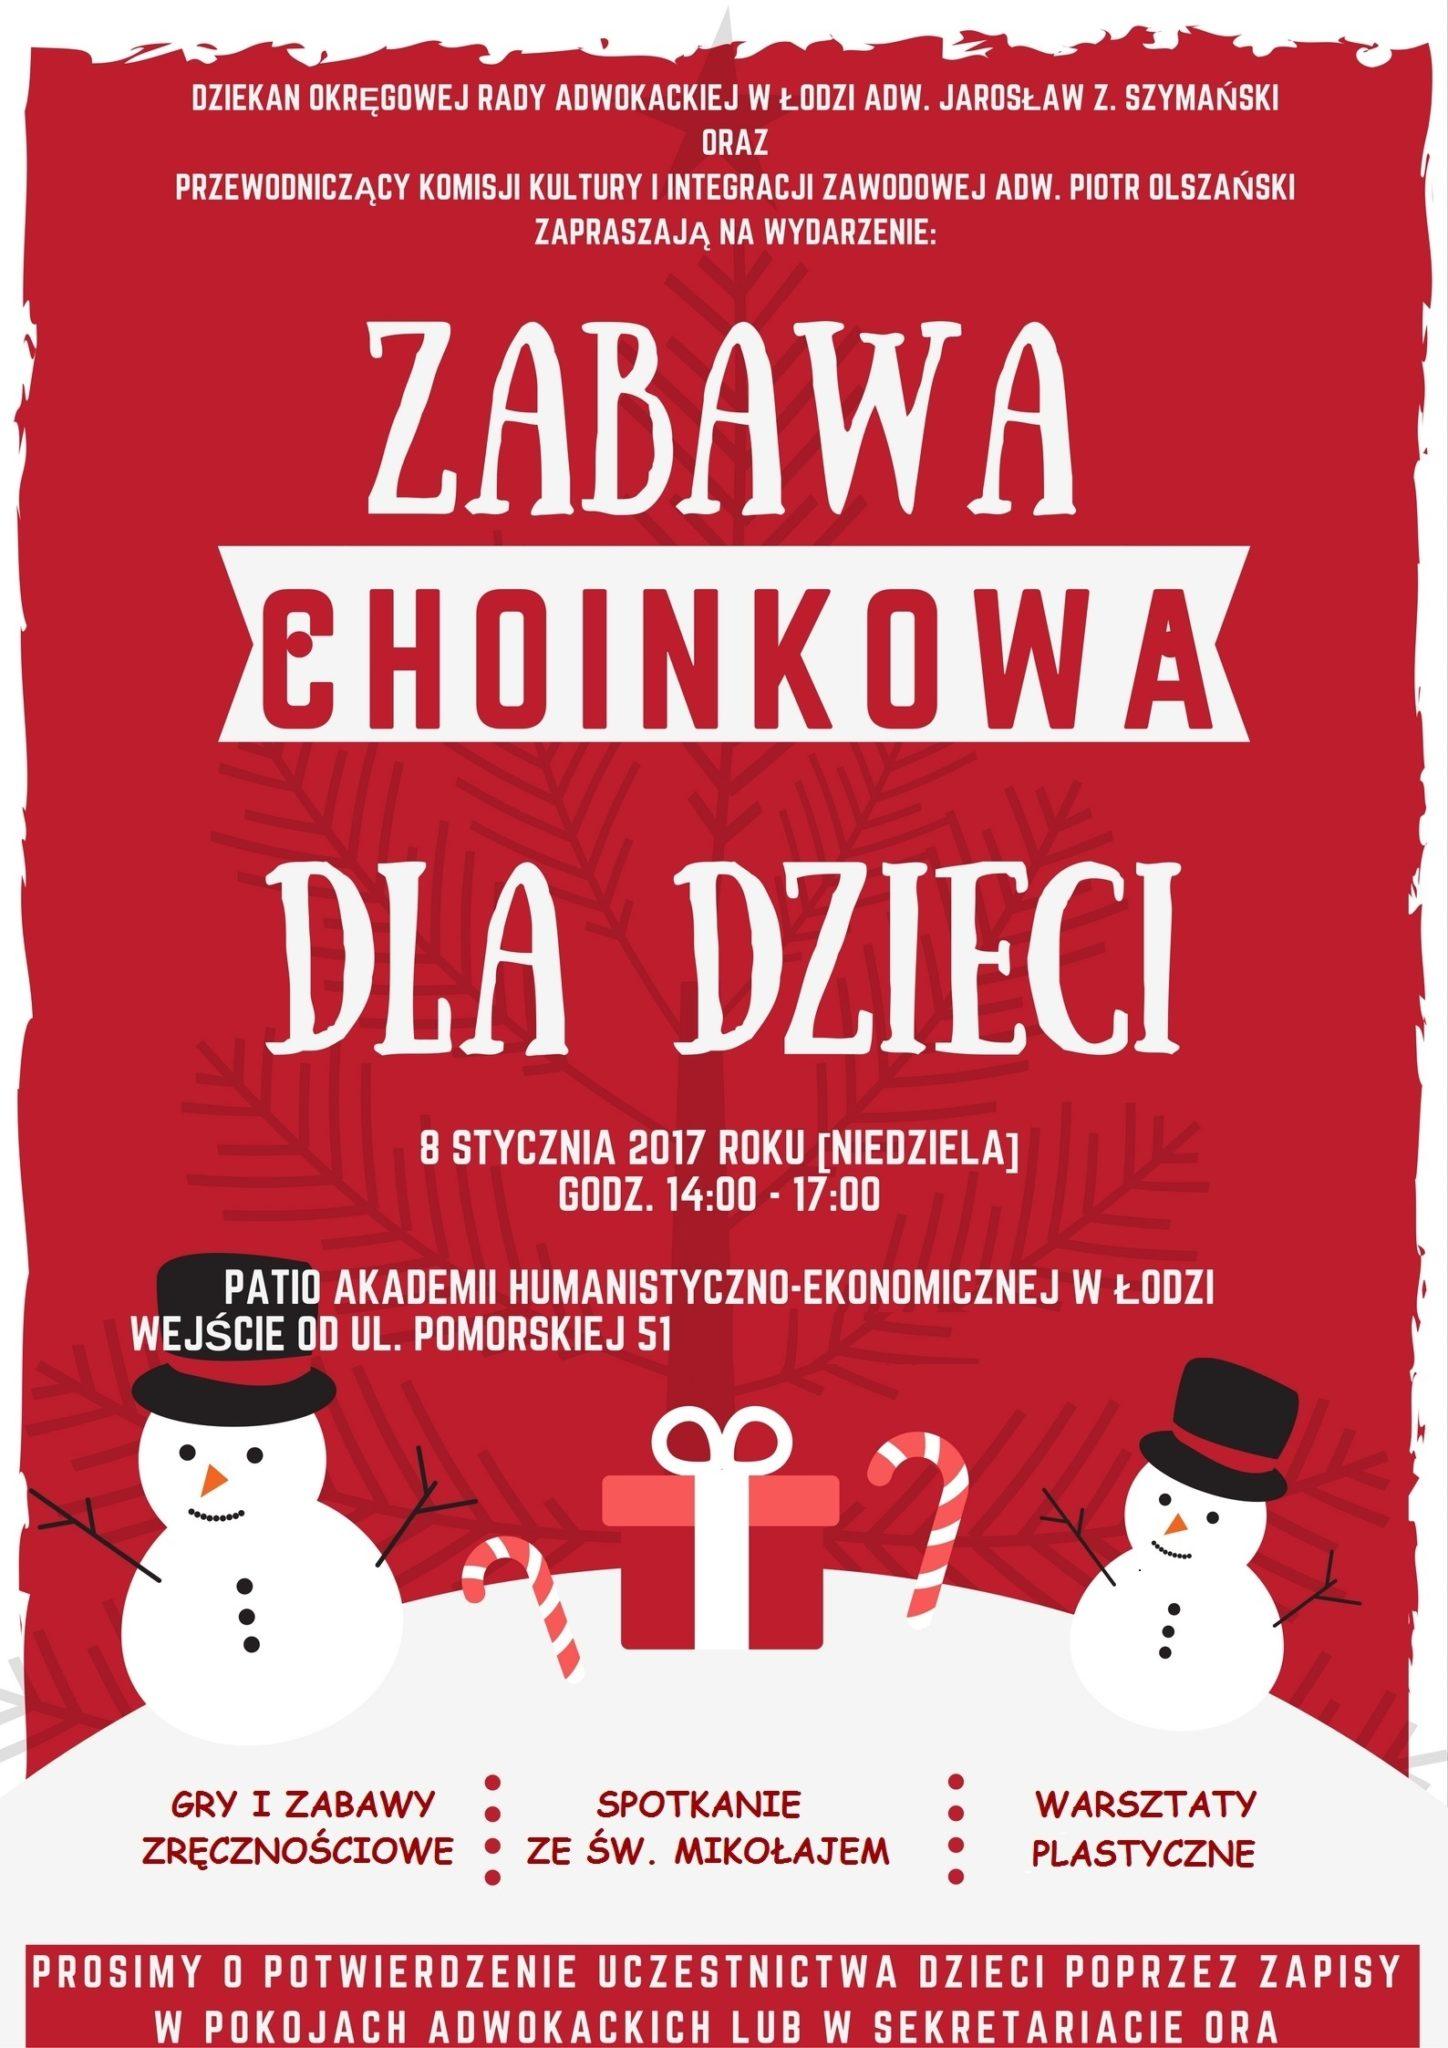 https://lodz.adwokatura.pl/wp-content/uploads/2019/04/file-plakat-1-2627.jpg